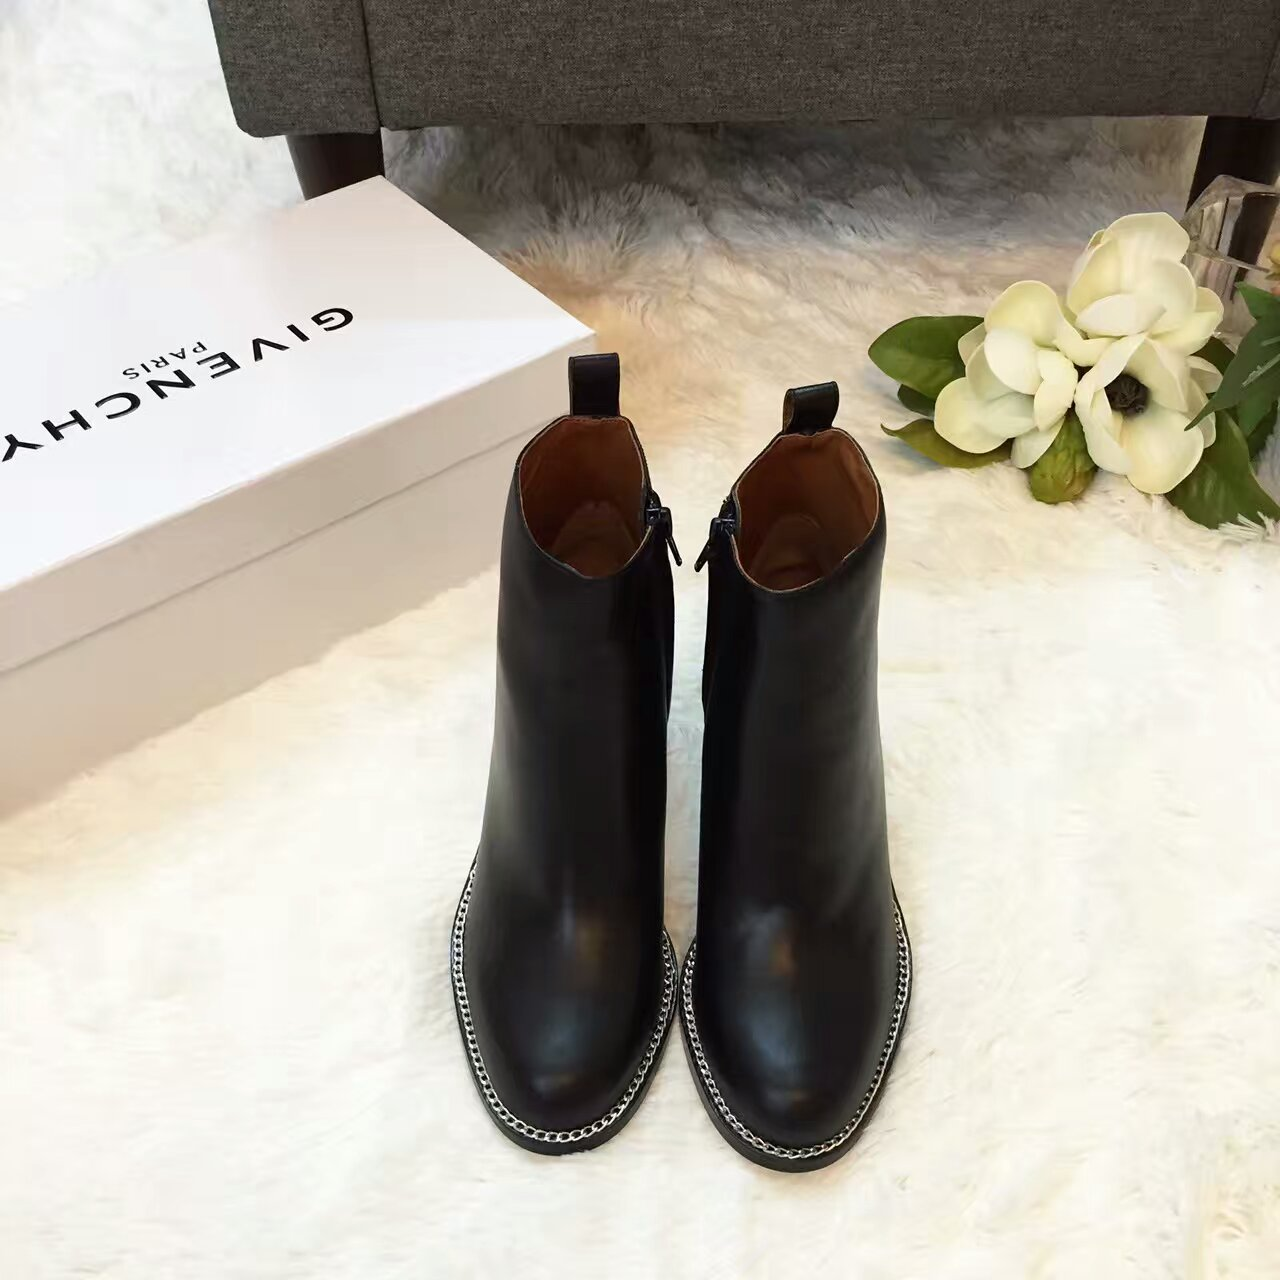 原单正品【GIVENCHY纪梵希】2016FW马丁靴_短靴